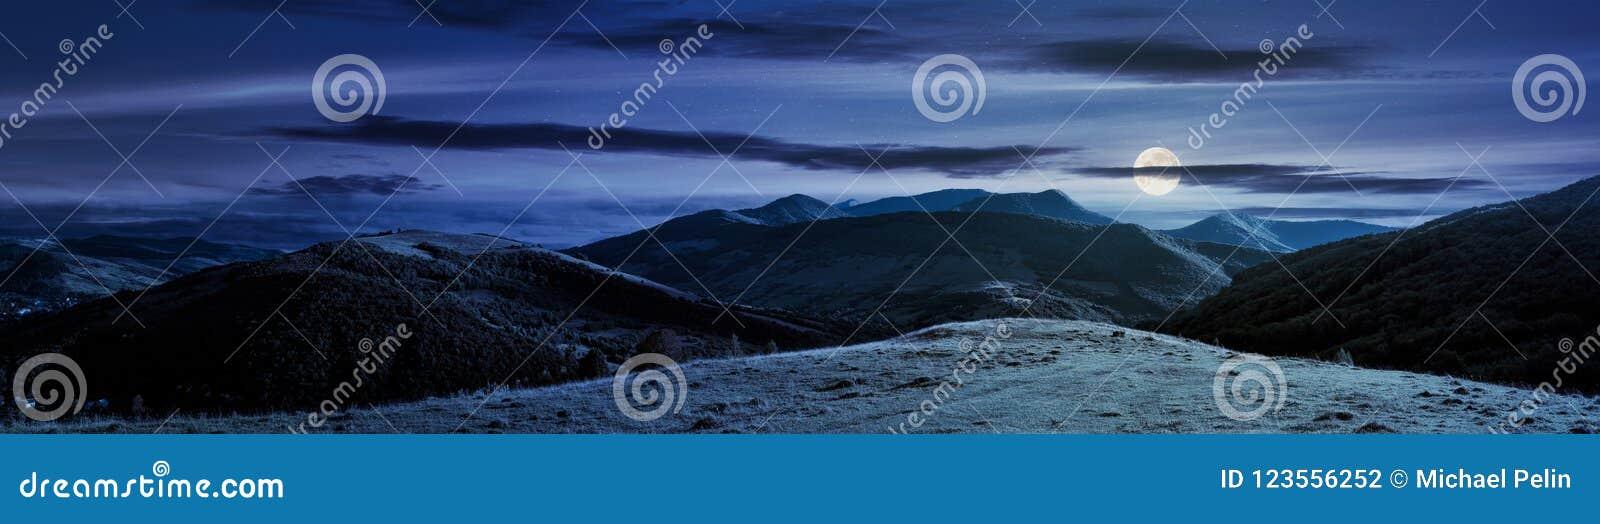 Panorama van bergachtig platteland bij nacht